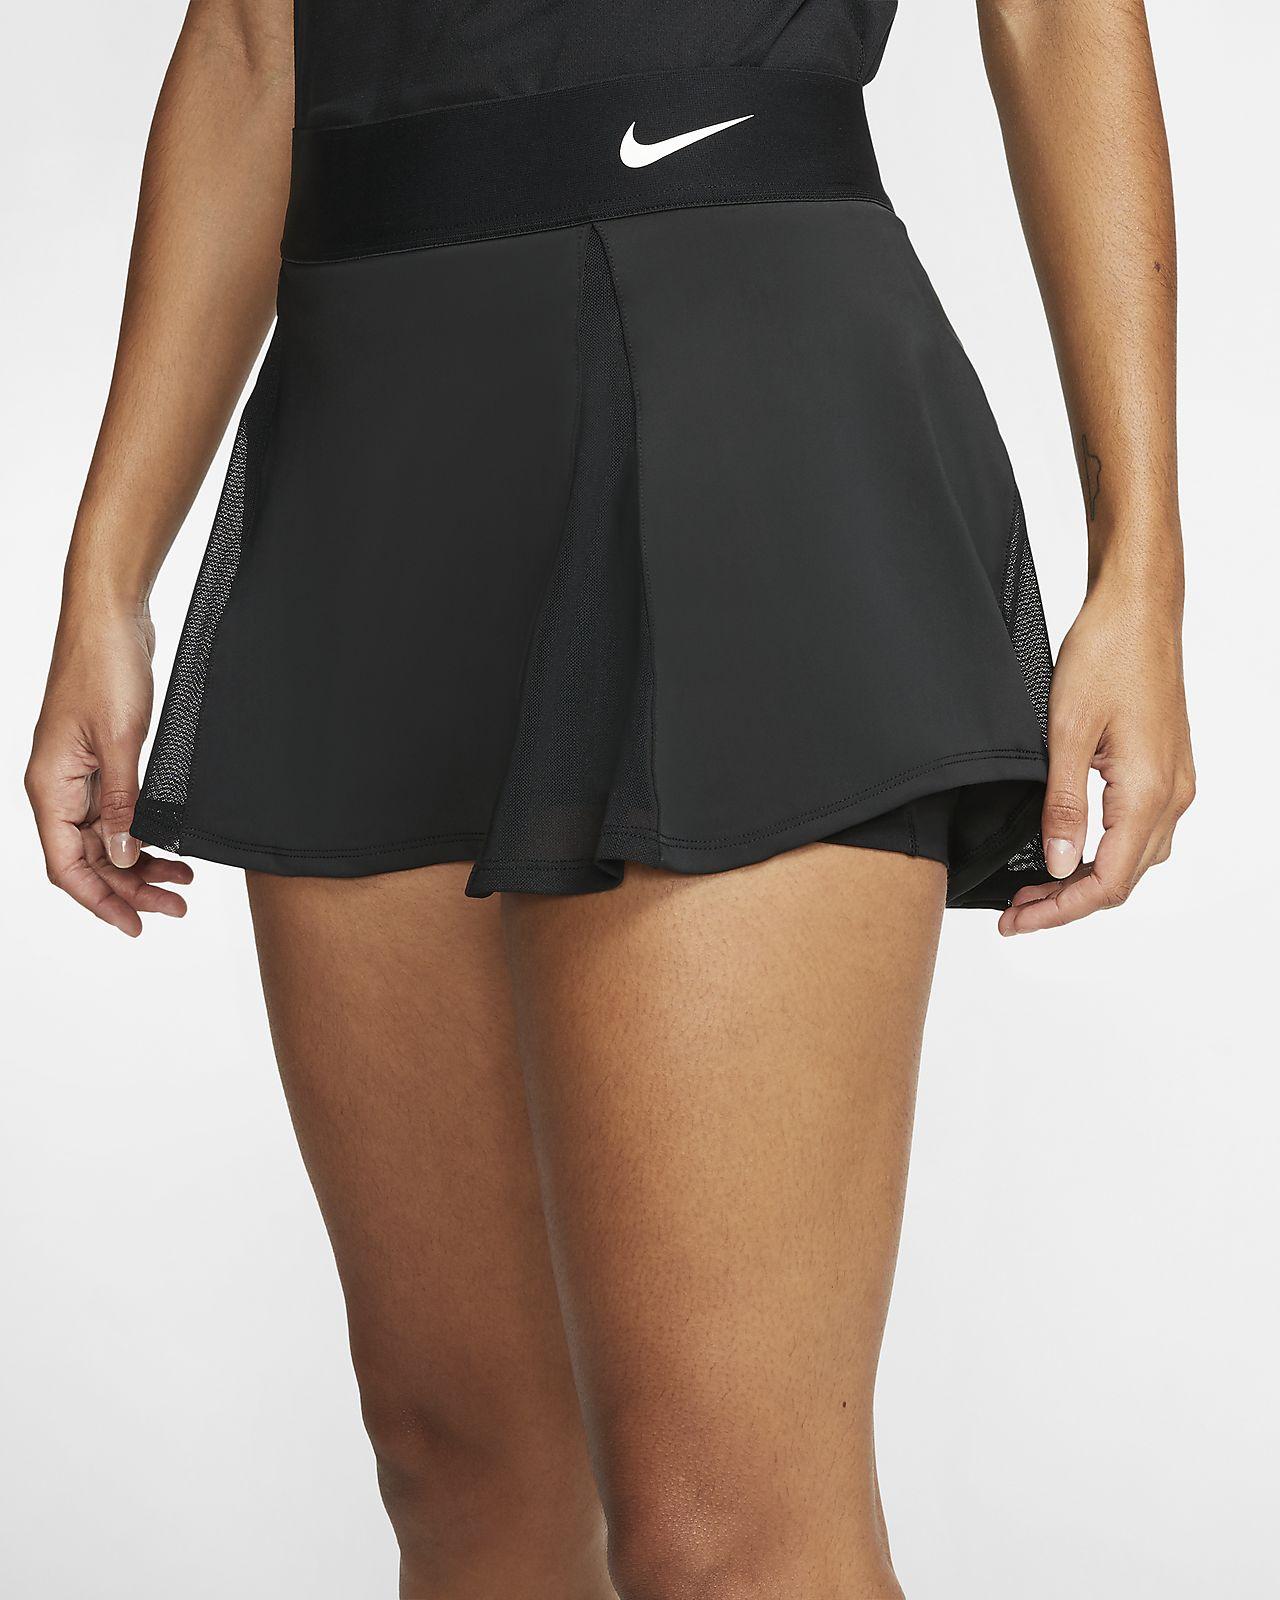 NikeCourt Women's Tennis Skirt